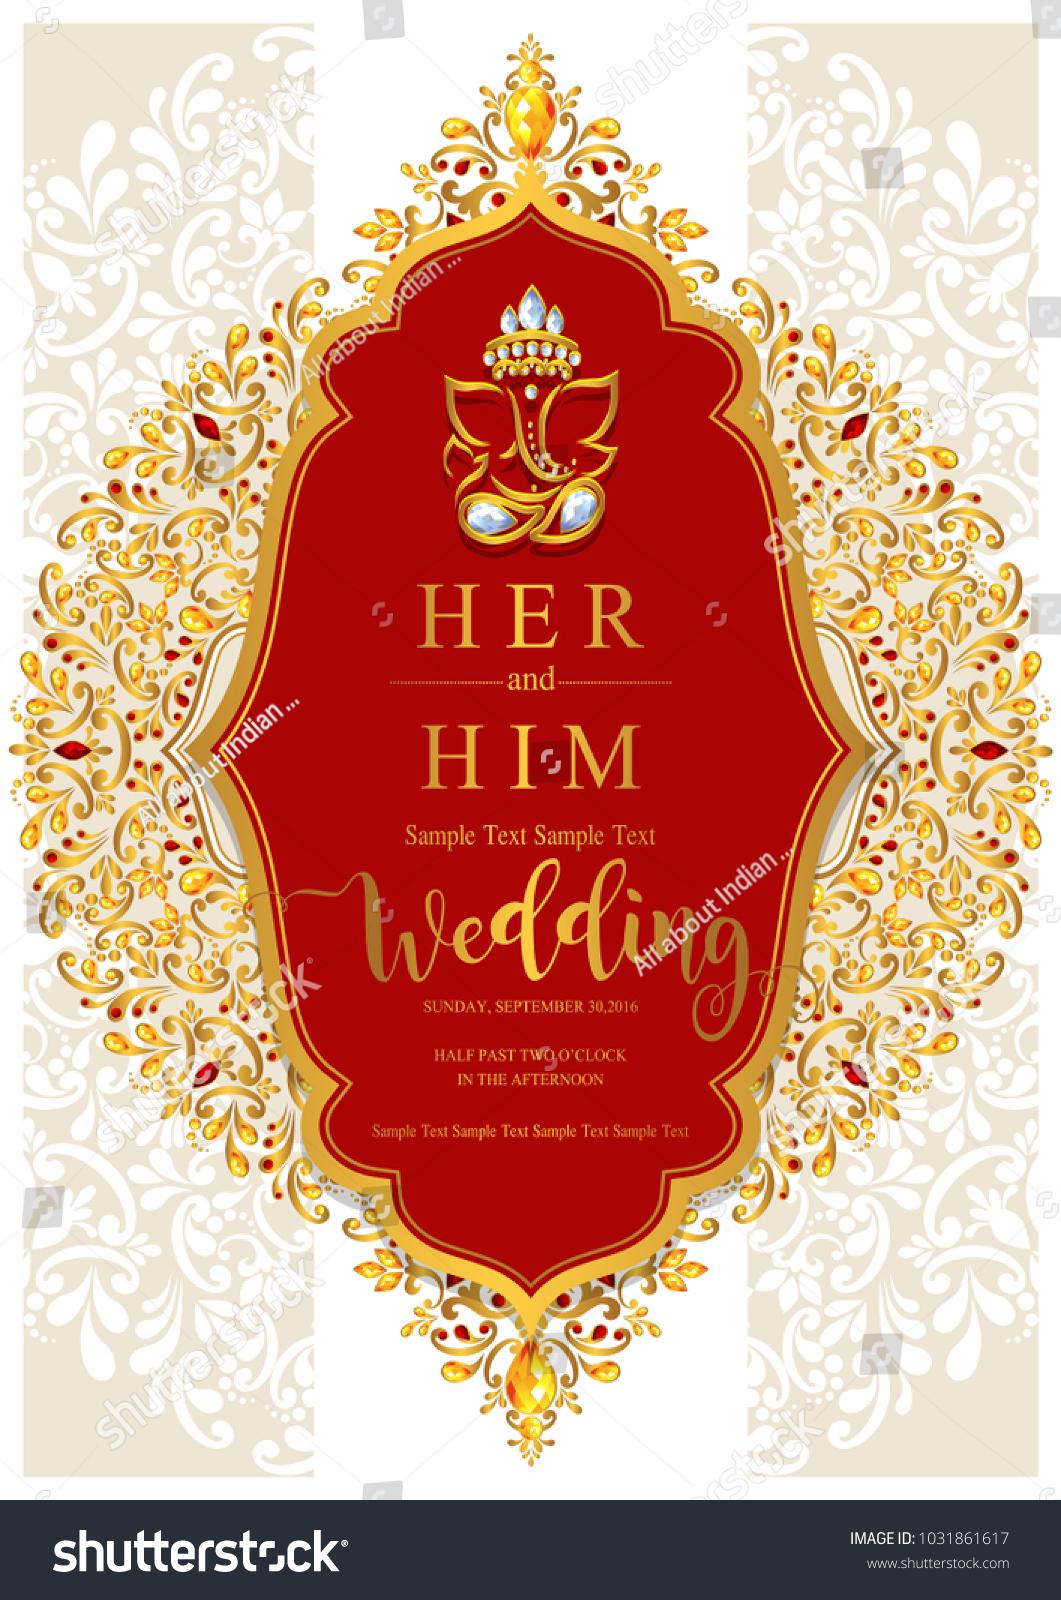 Indian Wedding Invitation Card Templates Gold Stock Vector ...